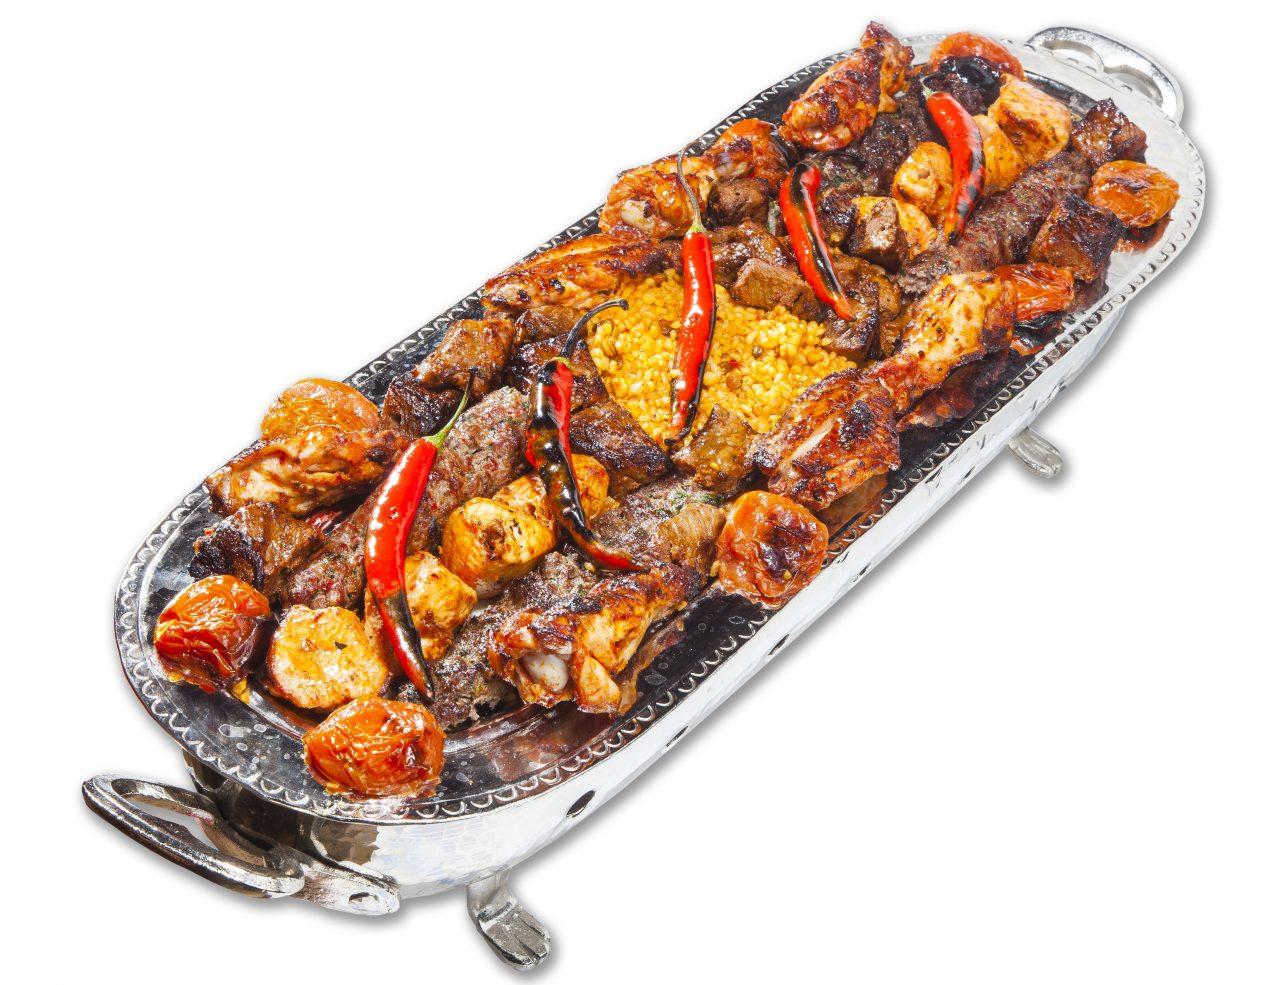 Mix-kebab-1280x985.jpg